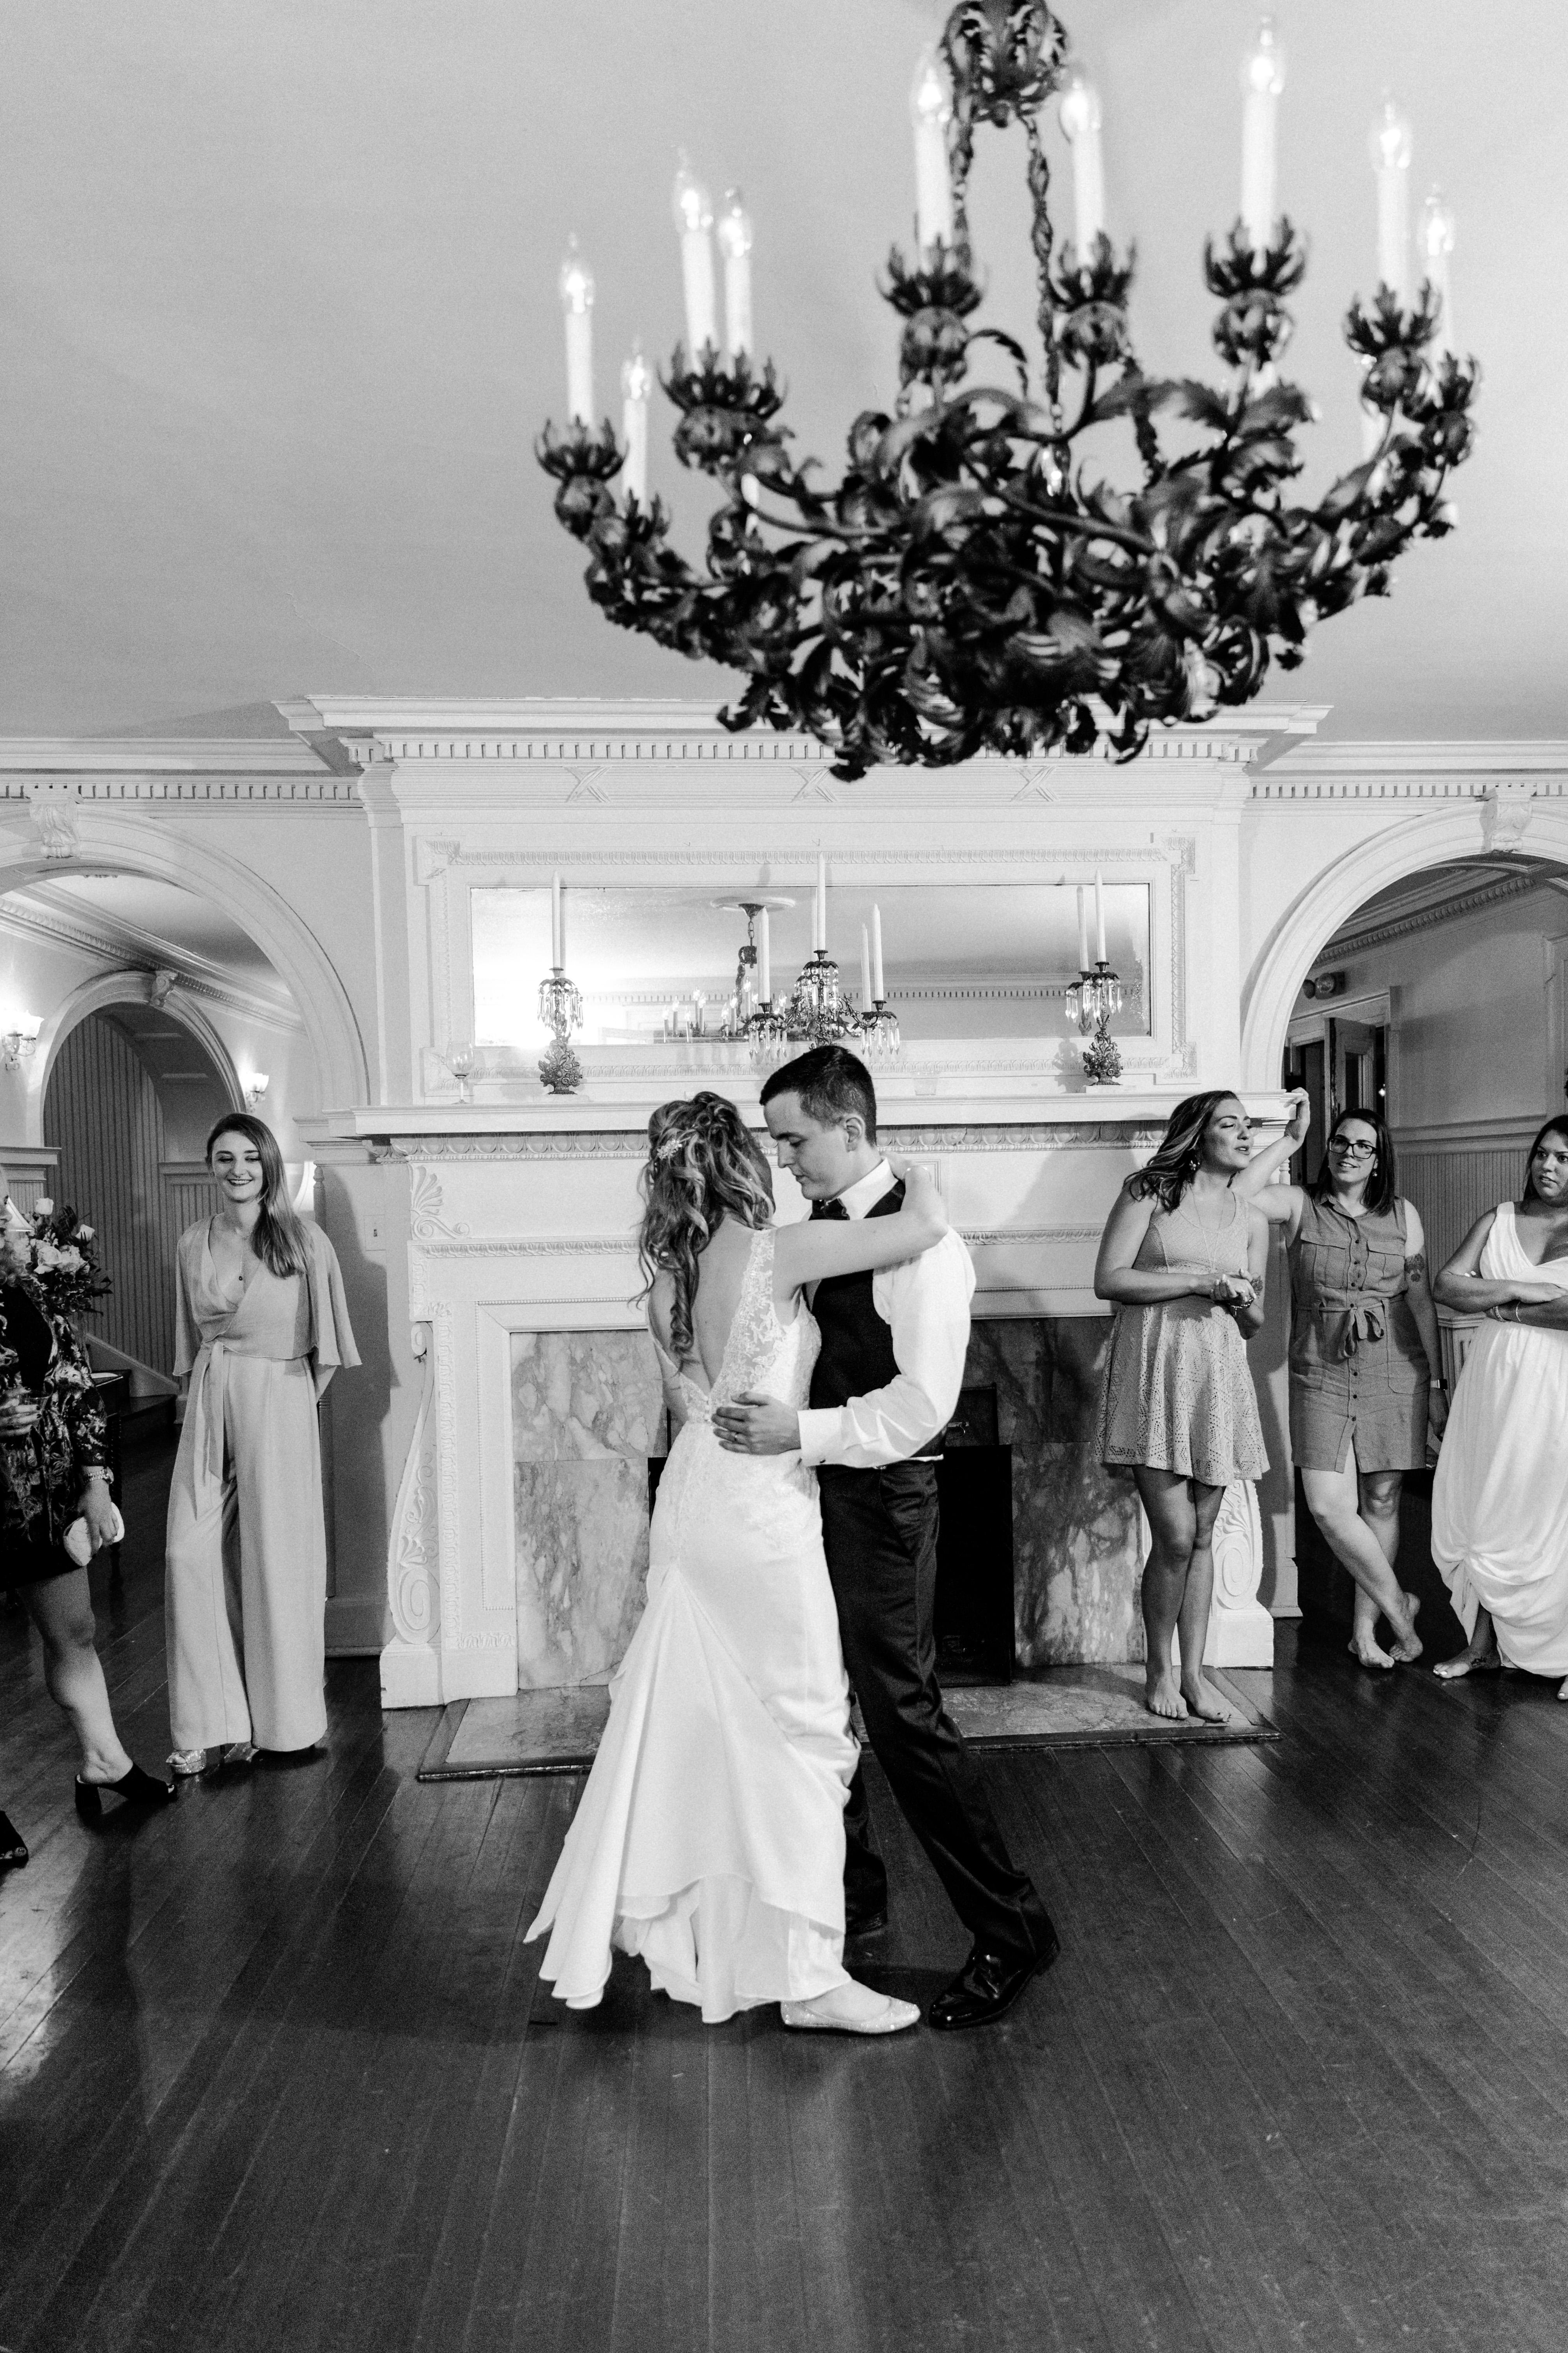 B&W couple dancing